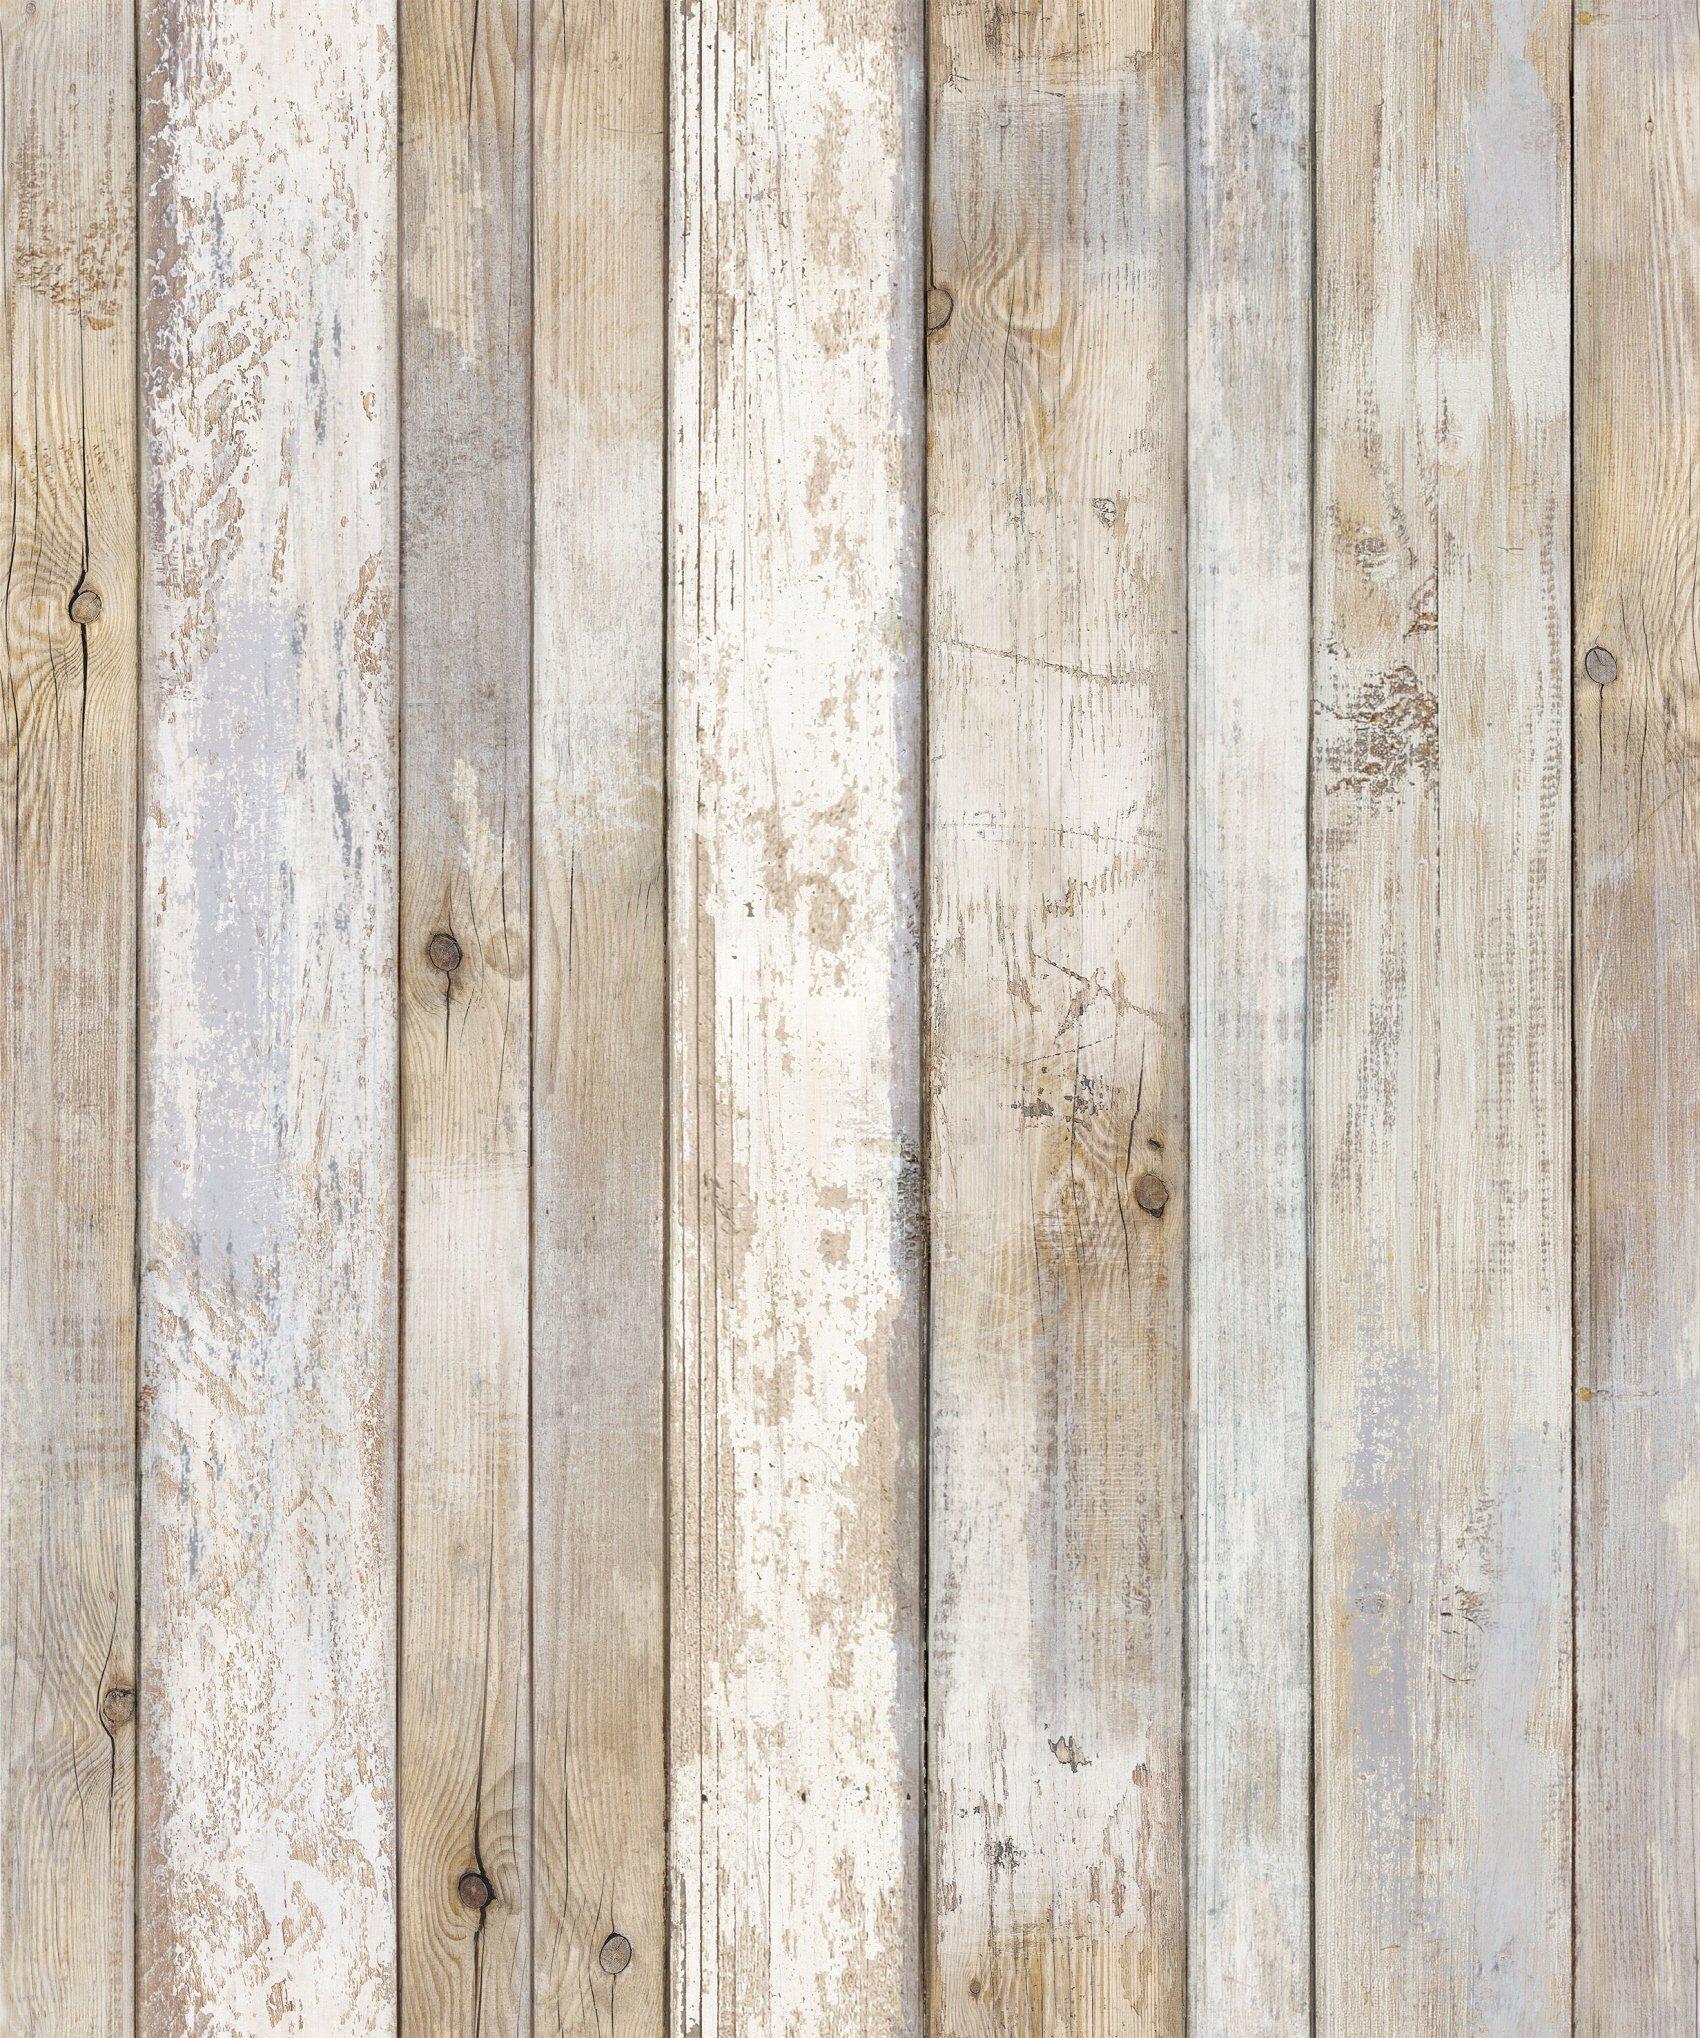 Reclaimed Wood Distressed Wood Panel Wood Grain Self-Adhesive Peel-Stick Wallpaper (VBS308) by Very Berry Sticker